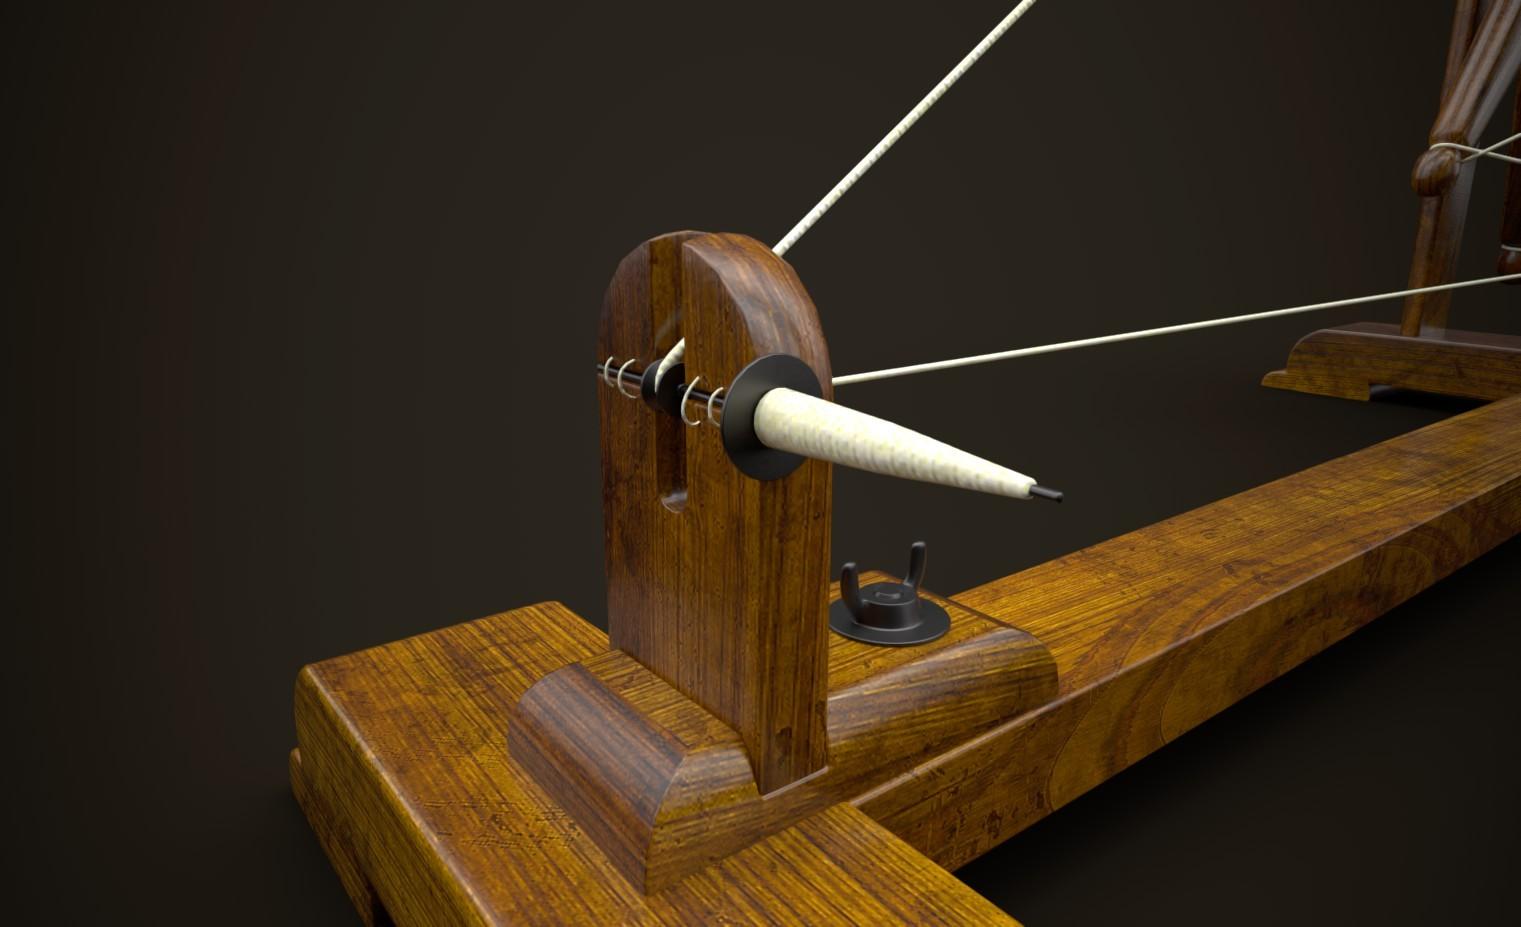 ArtStation - Charkha - The Handloom Spinning Wheel, Laxman